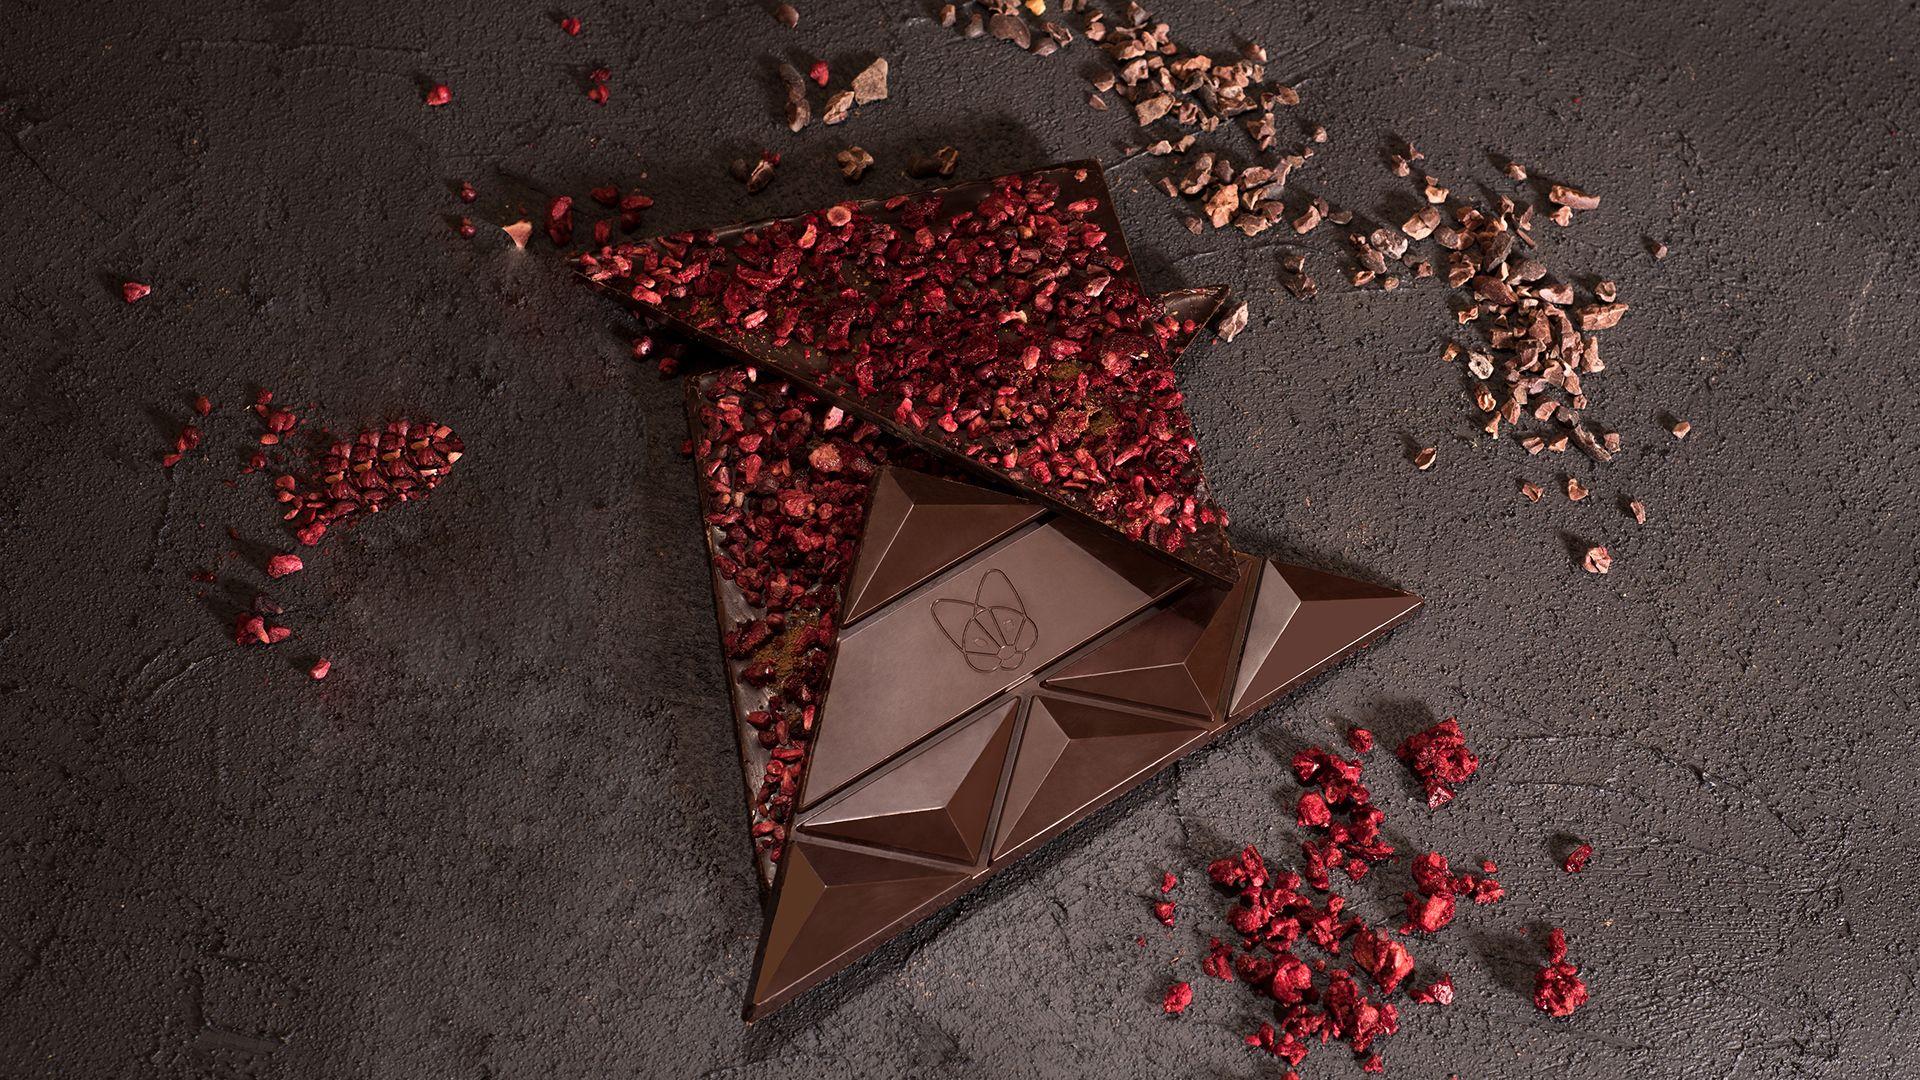 Aguara chocolate dedicated to wine Vranac